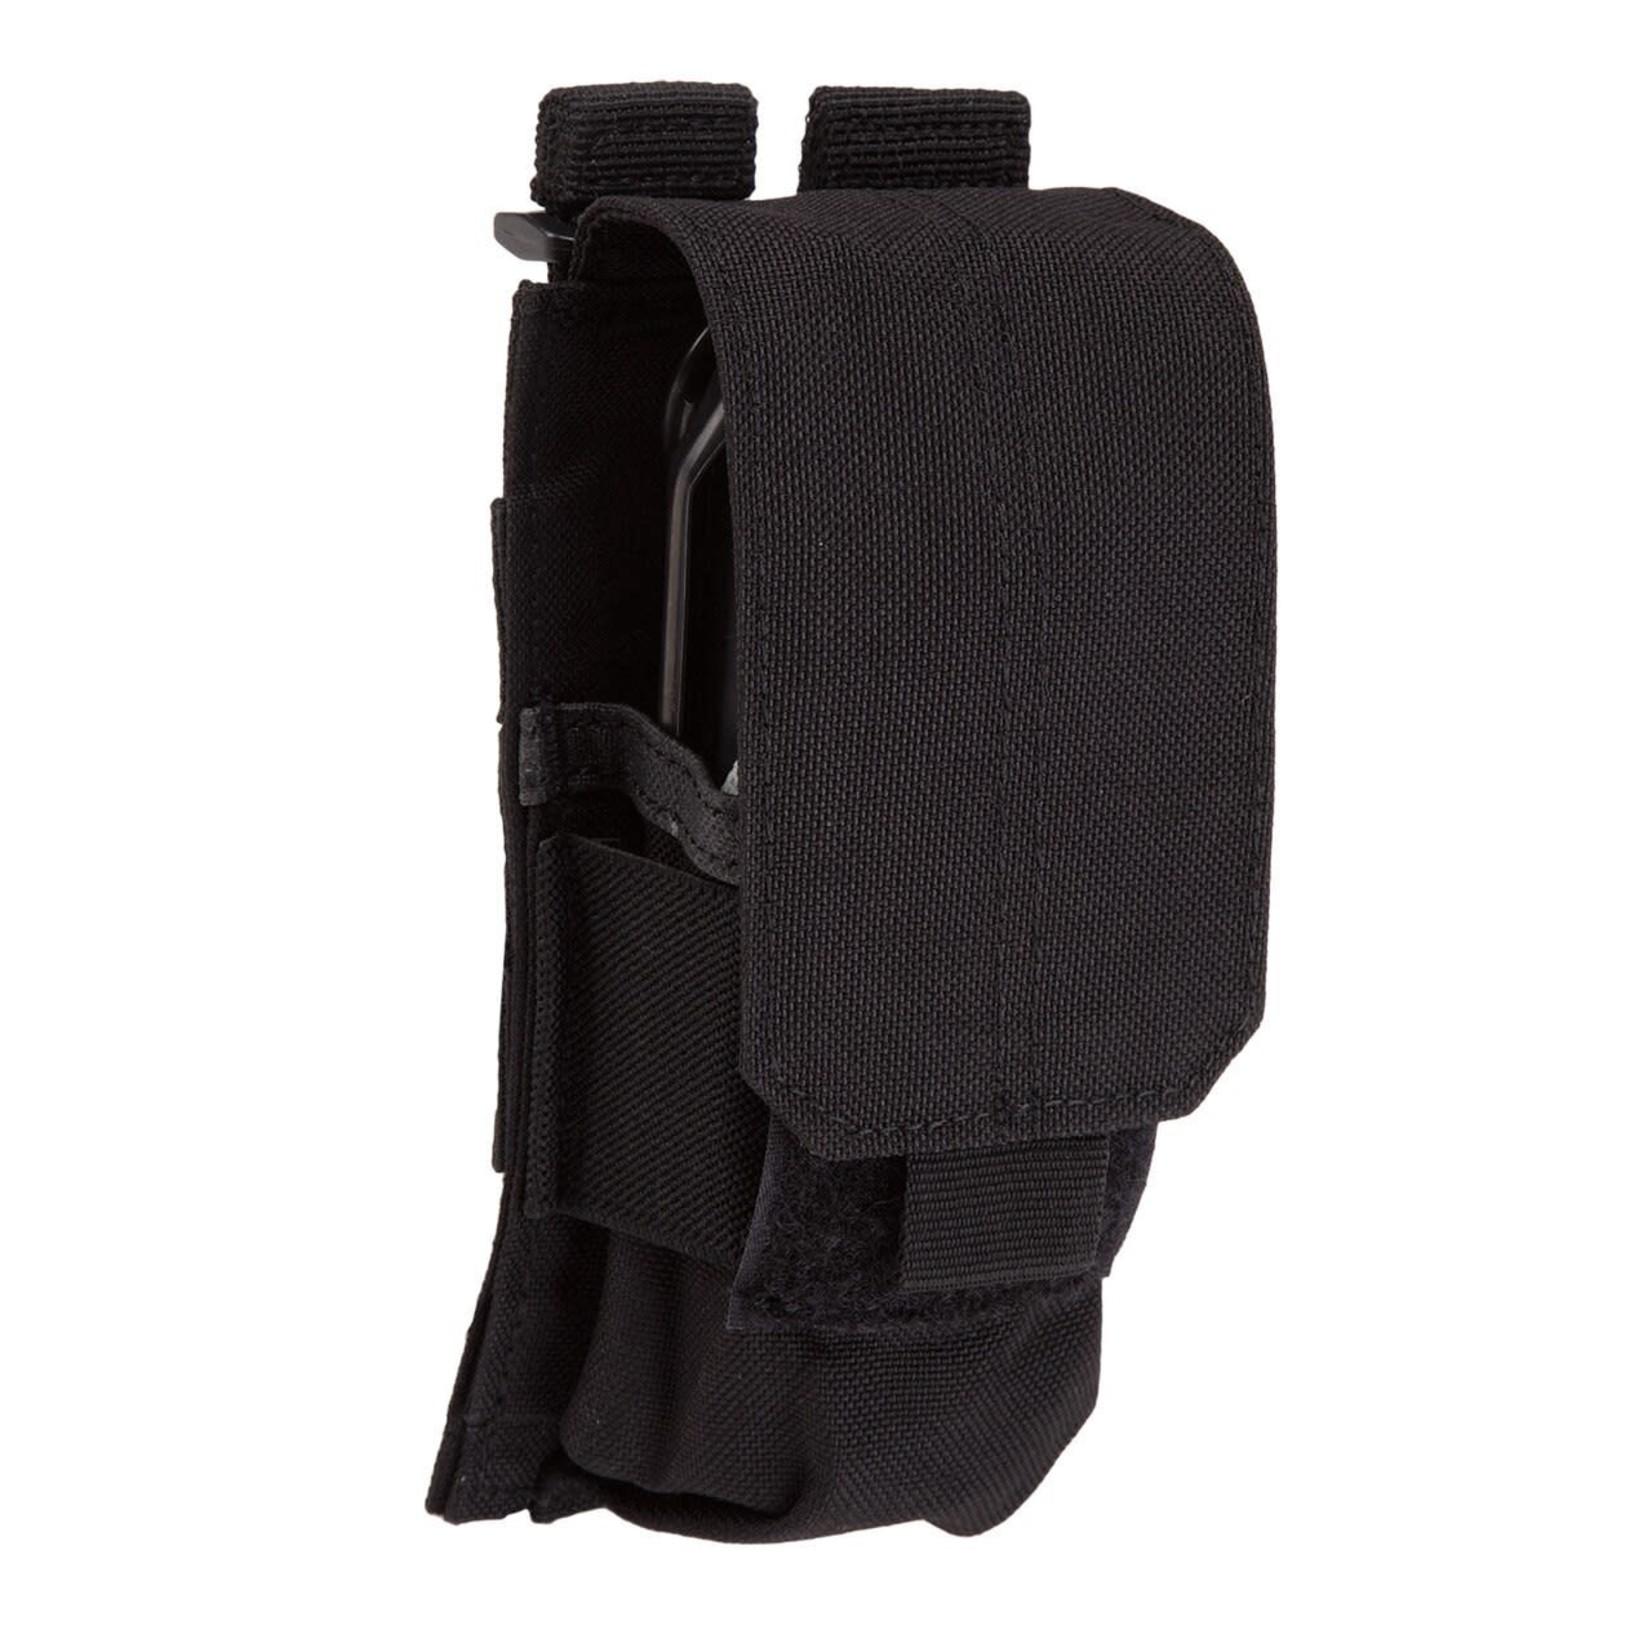 5.11 Tactical 5.11 Flash Bang Pouch..Color: Black..